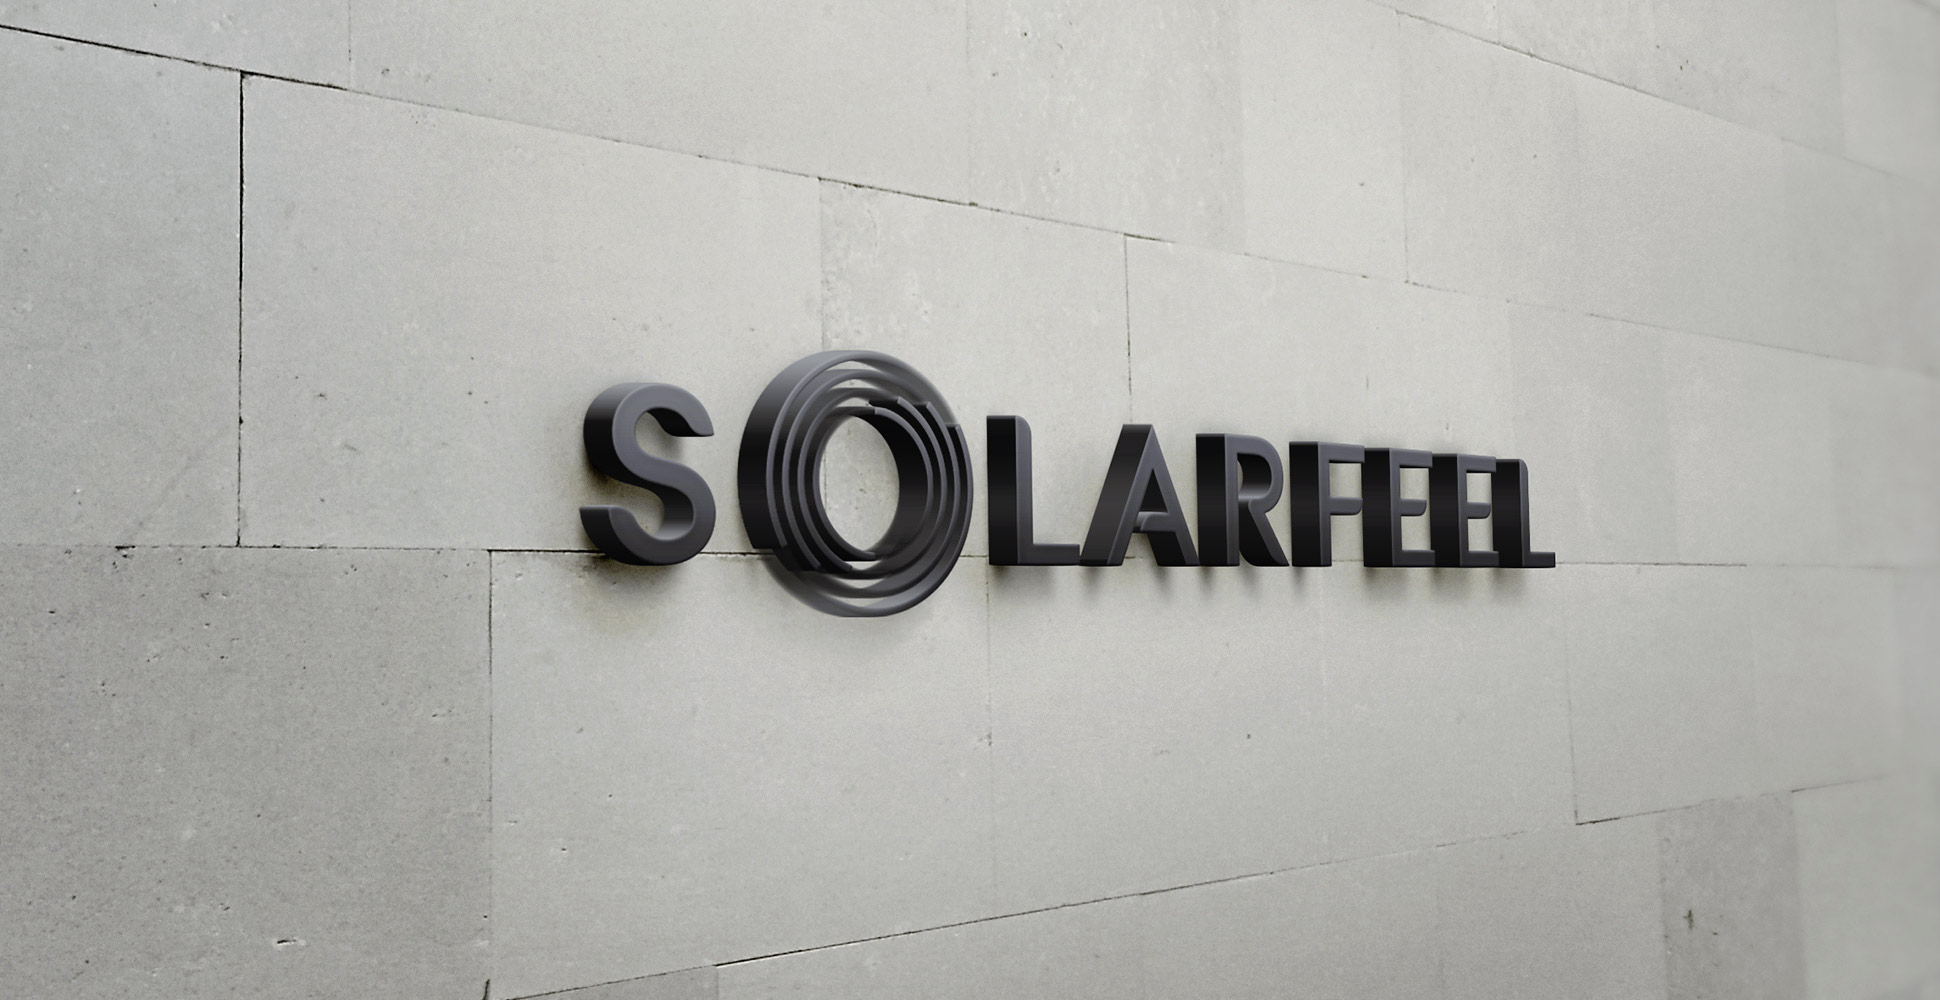 ikadia-portfolio-solarfeel-3